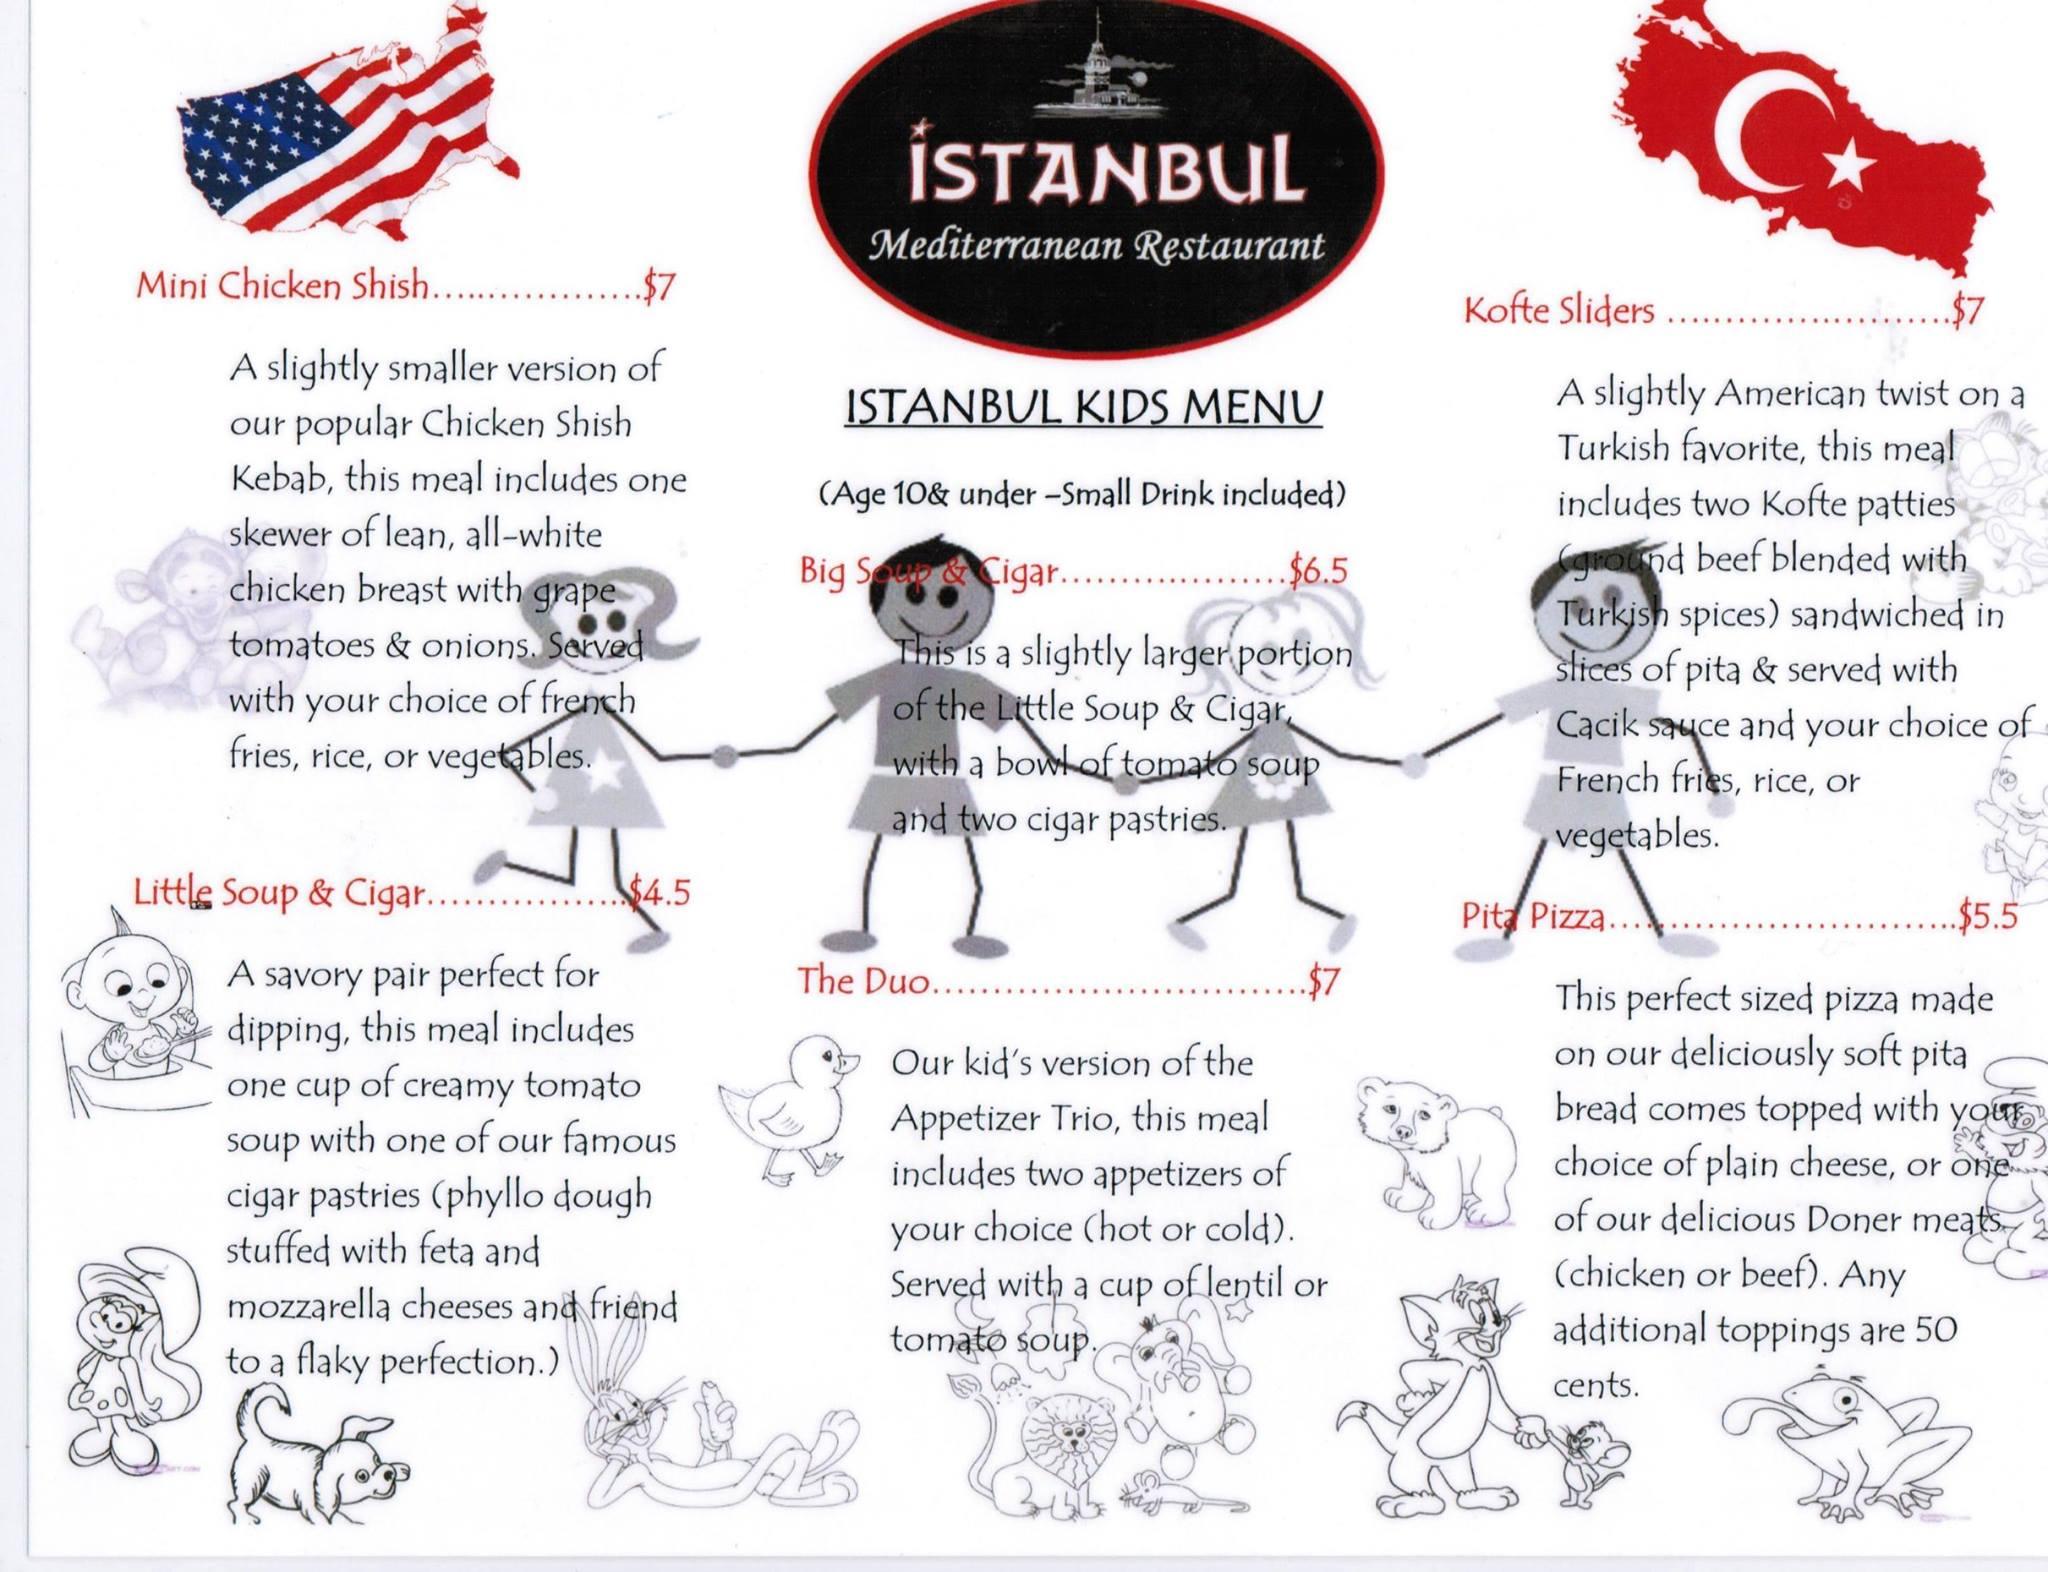 Istanbul Mediterranean Restaurant Kids Menu